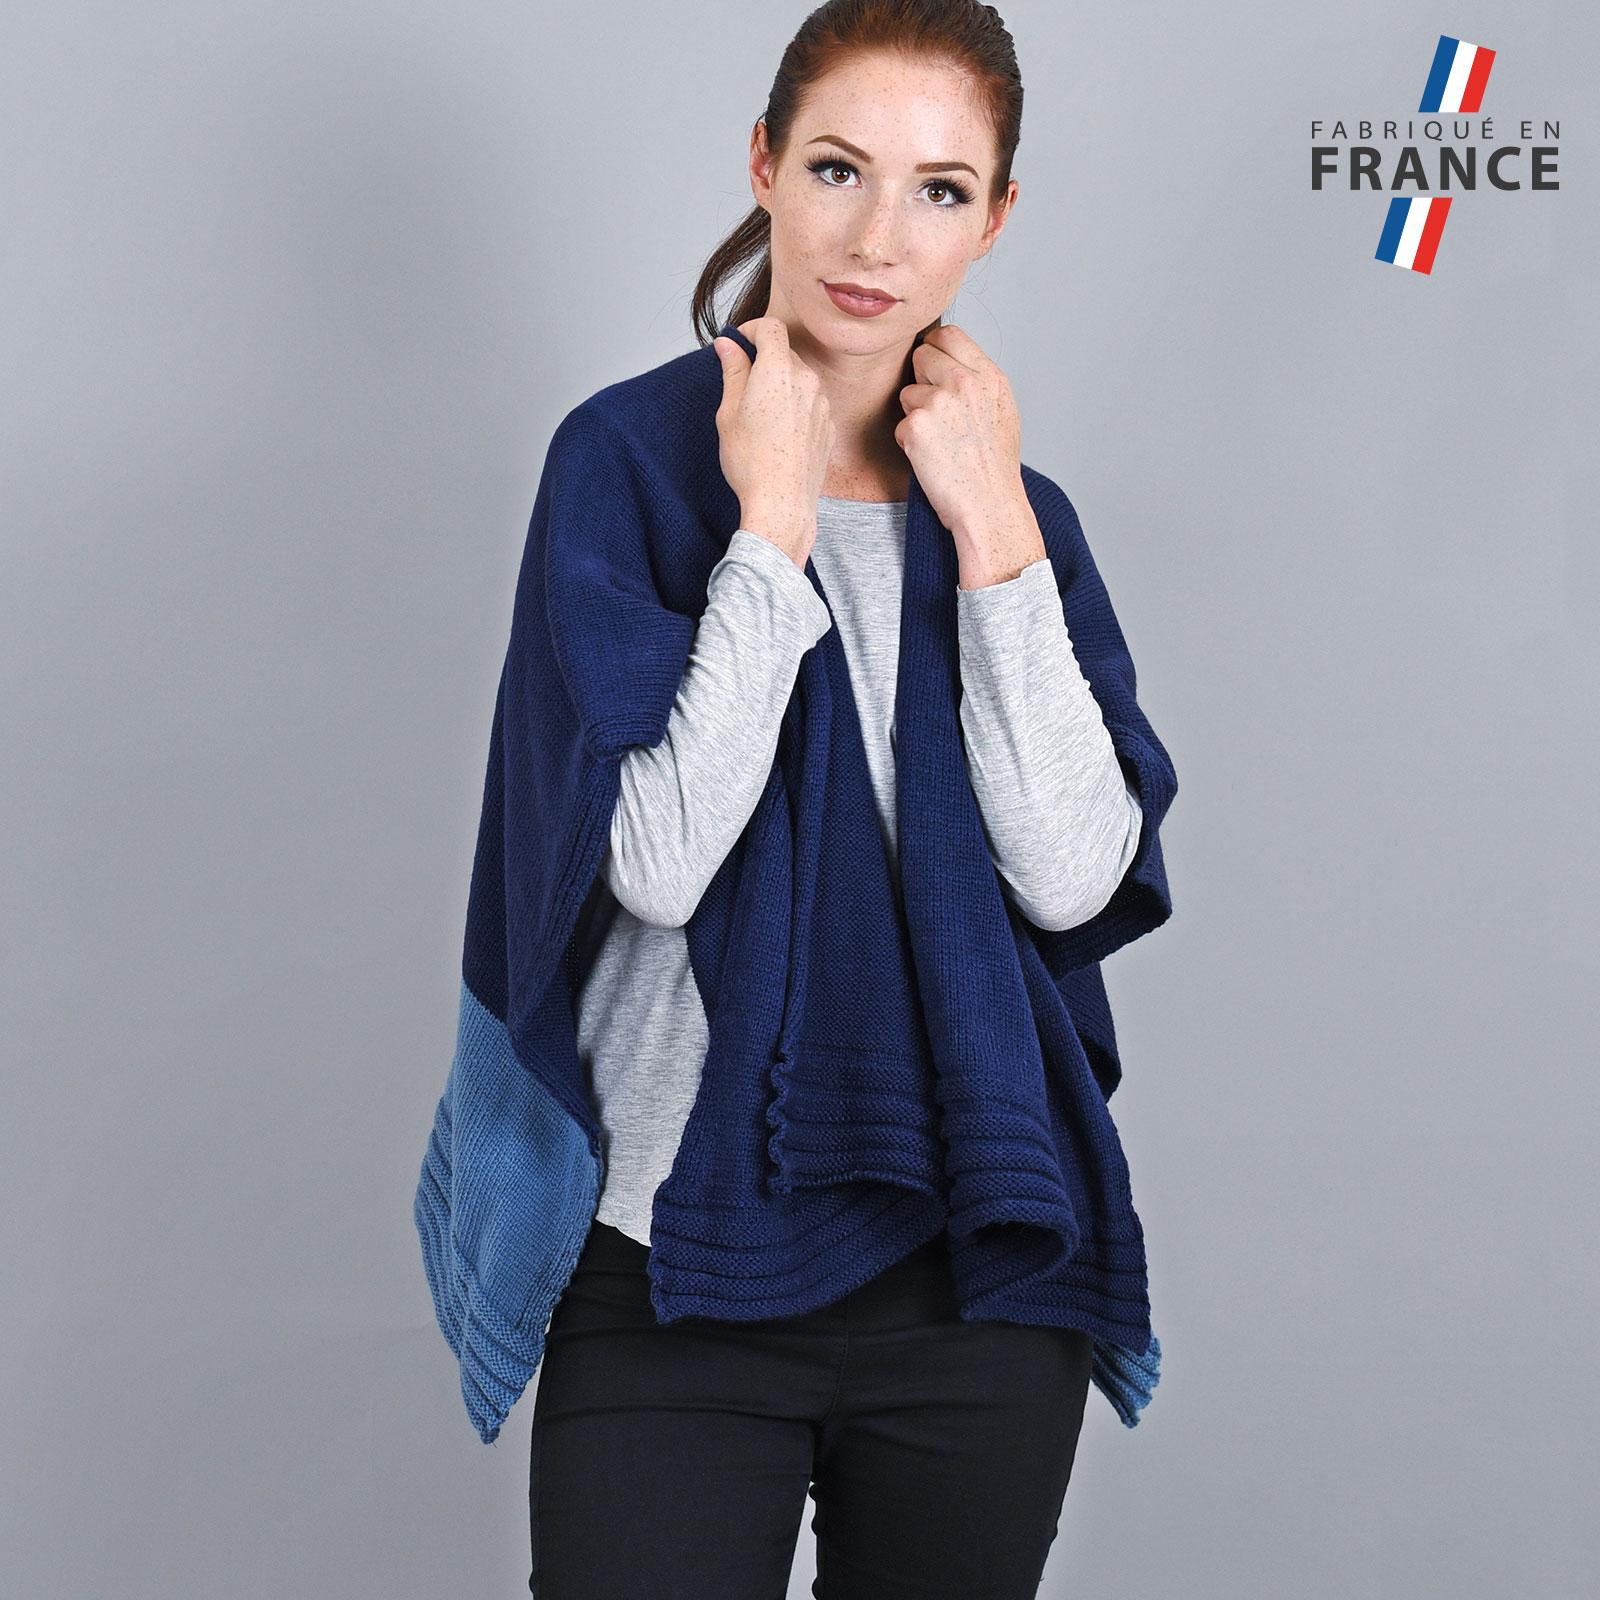 AT-03196-VF16-2-LB_FR-poncho-femme-gilet-bleu-fabrication-francaise